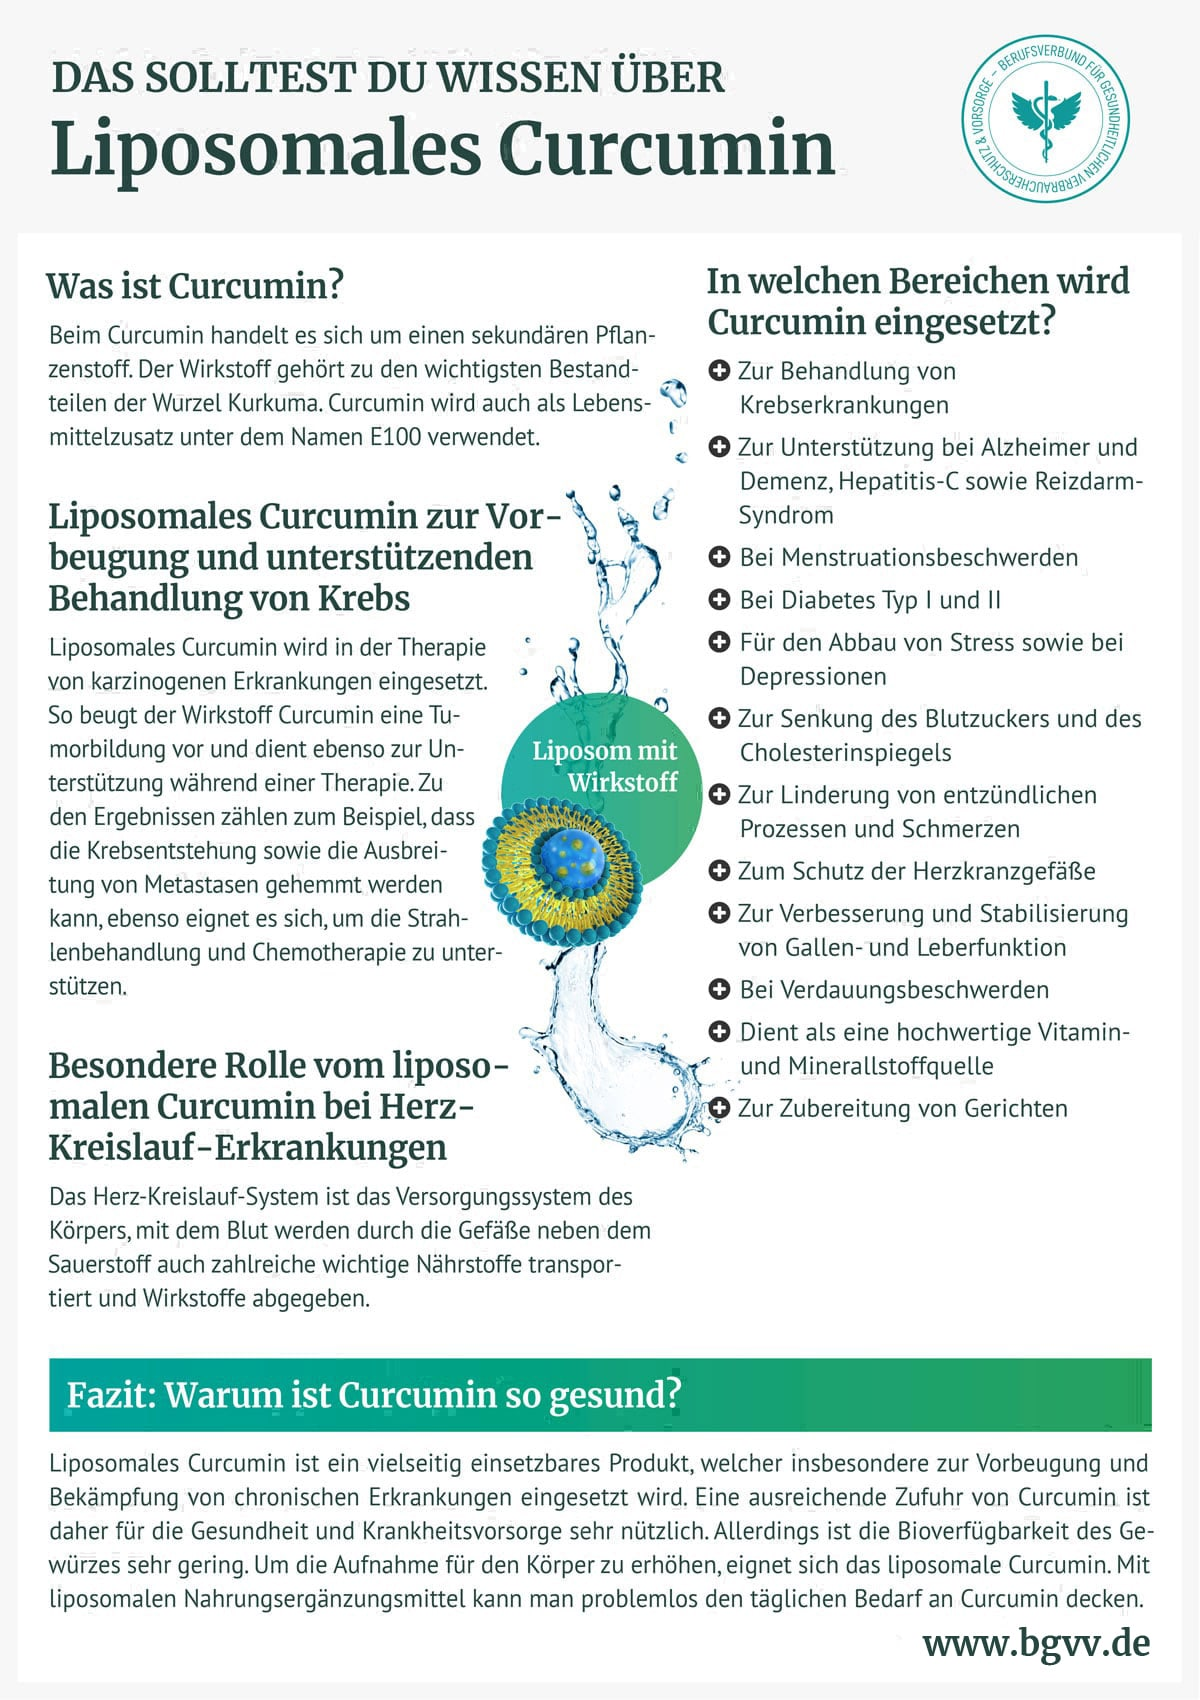 BGVV infografik Liposomales Curcumin